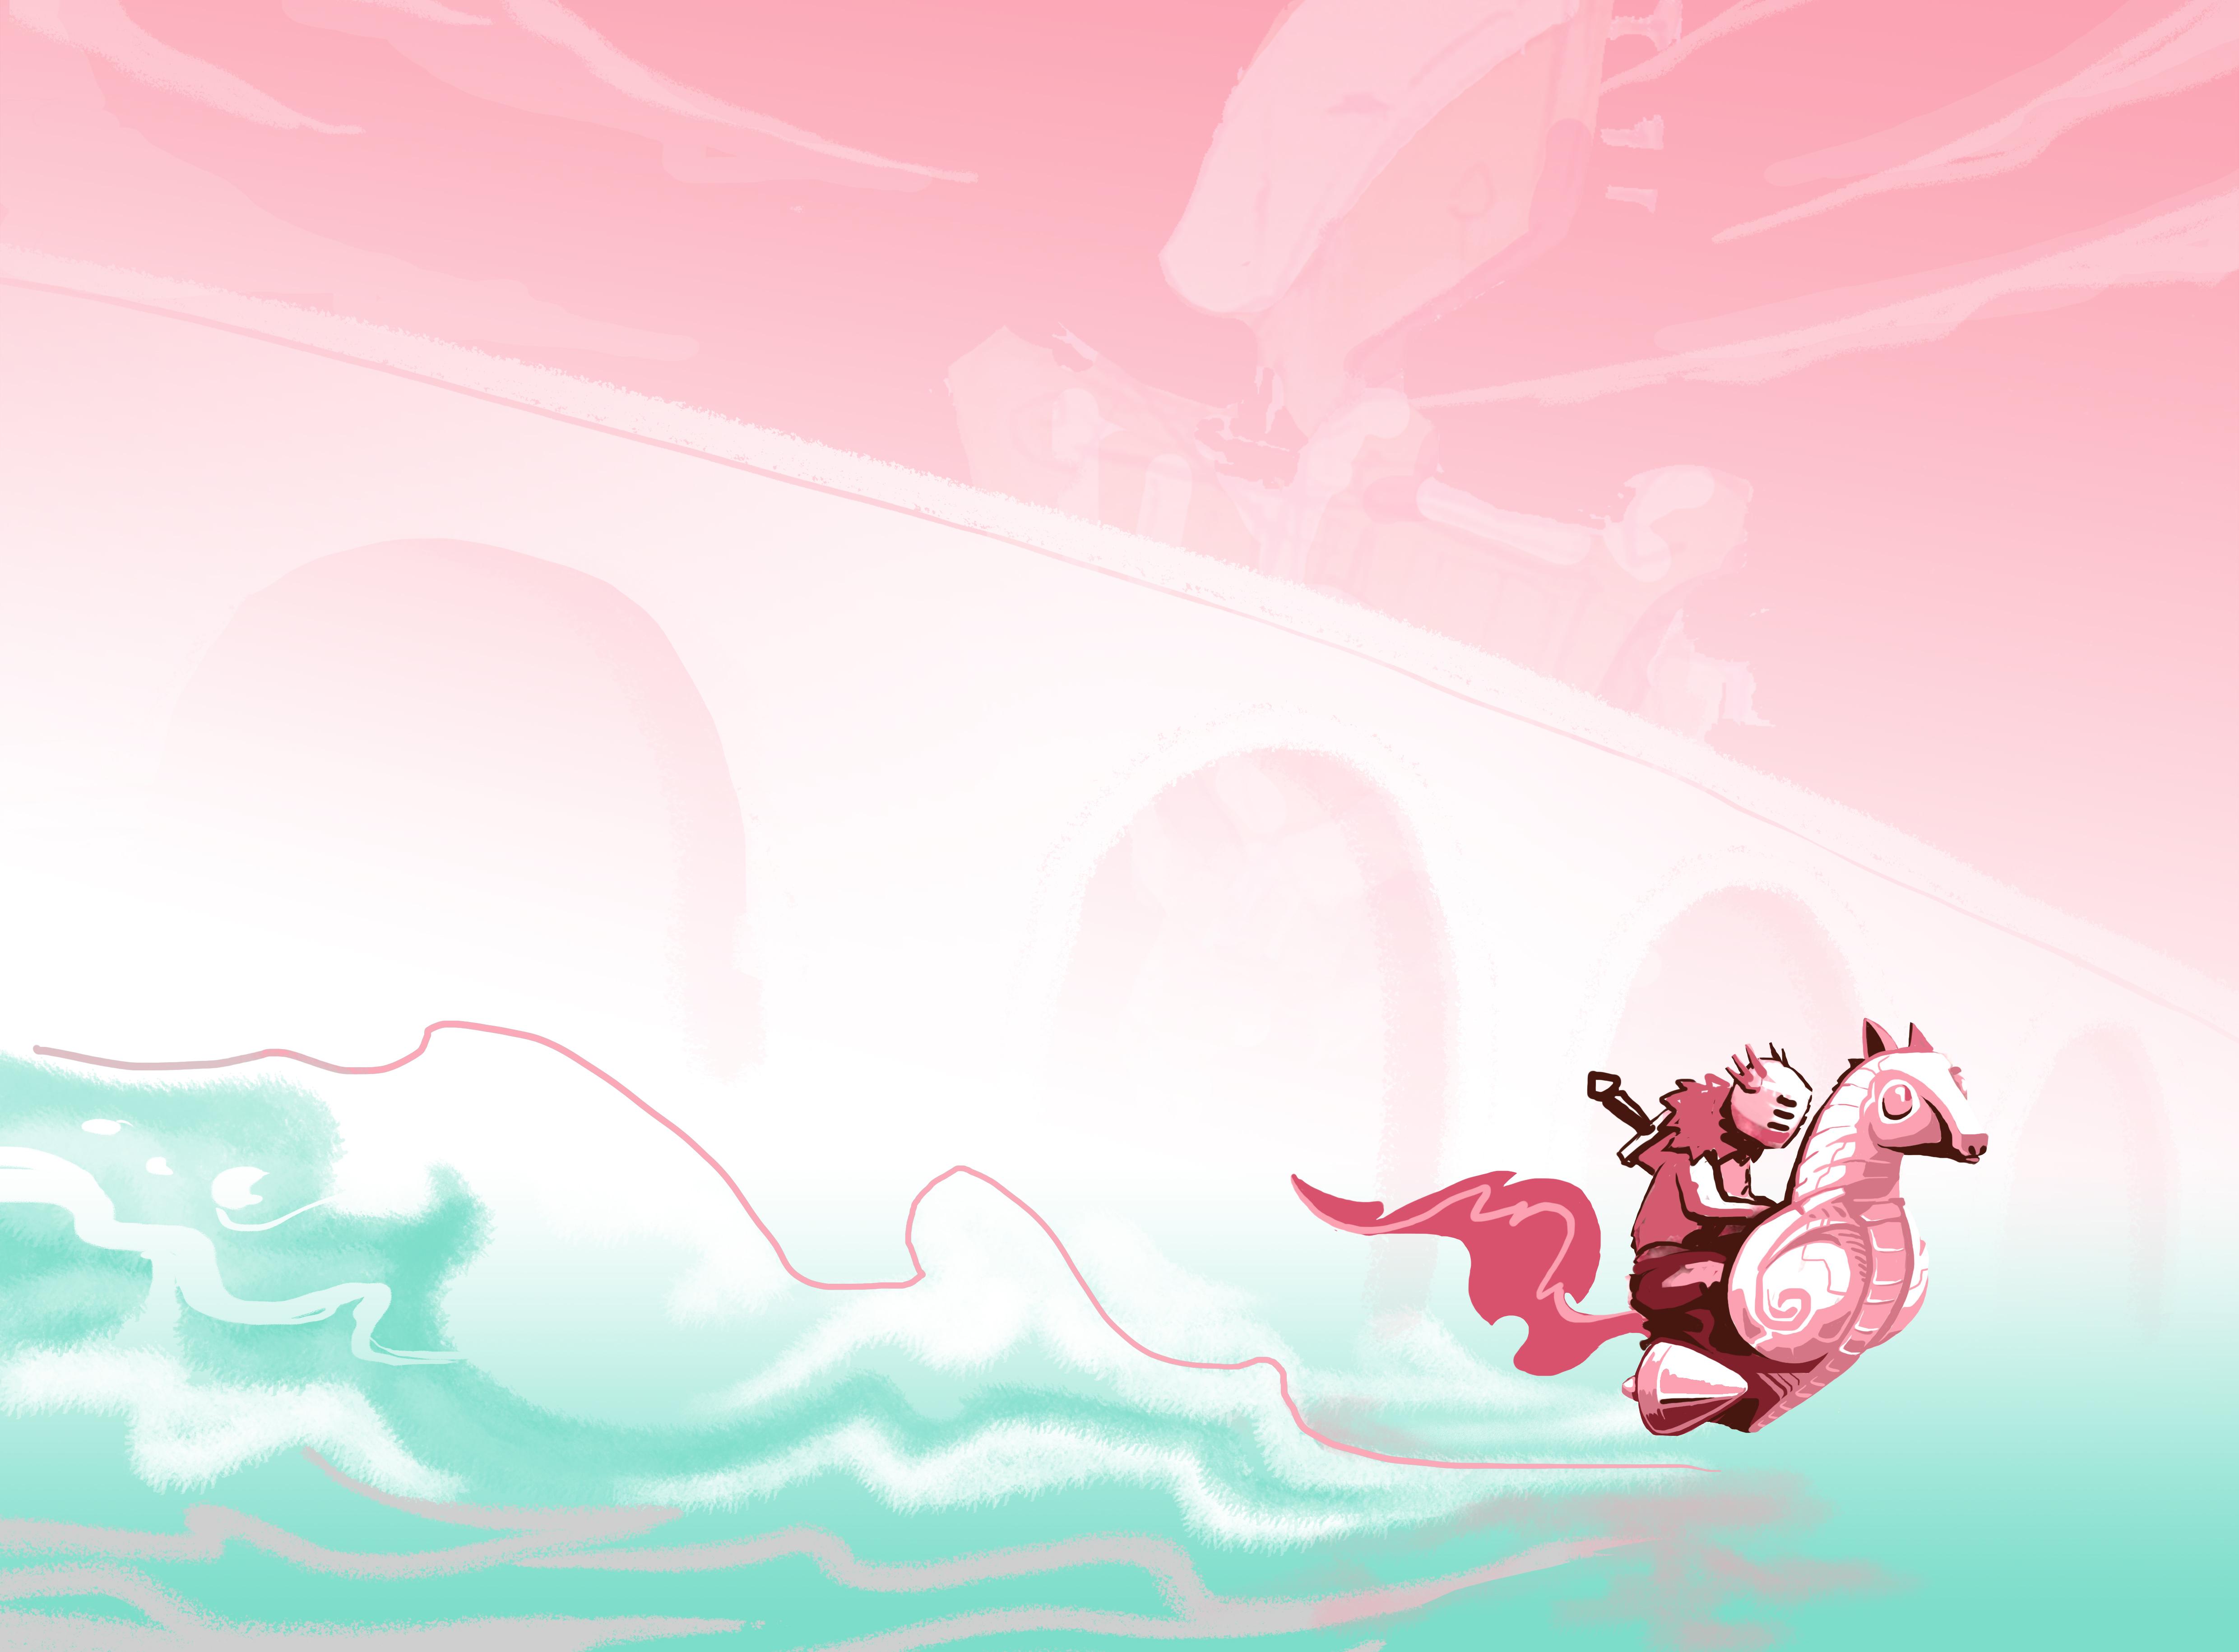 abys-illustration da-lyon rough fantasy engine knight king